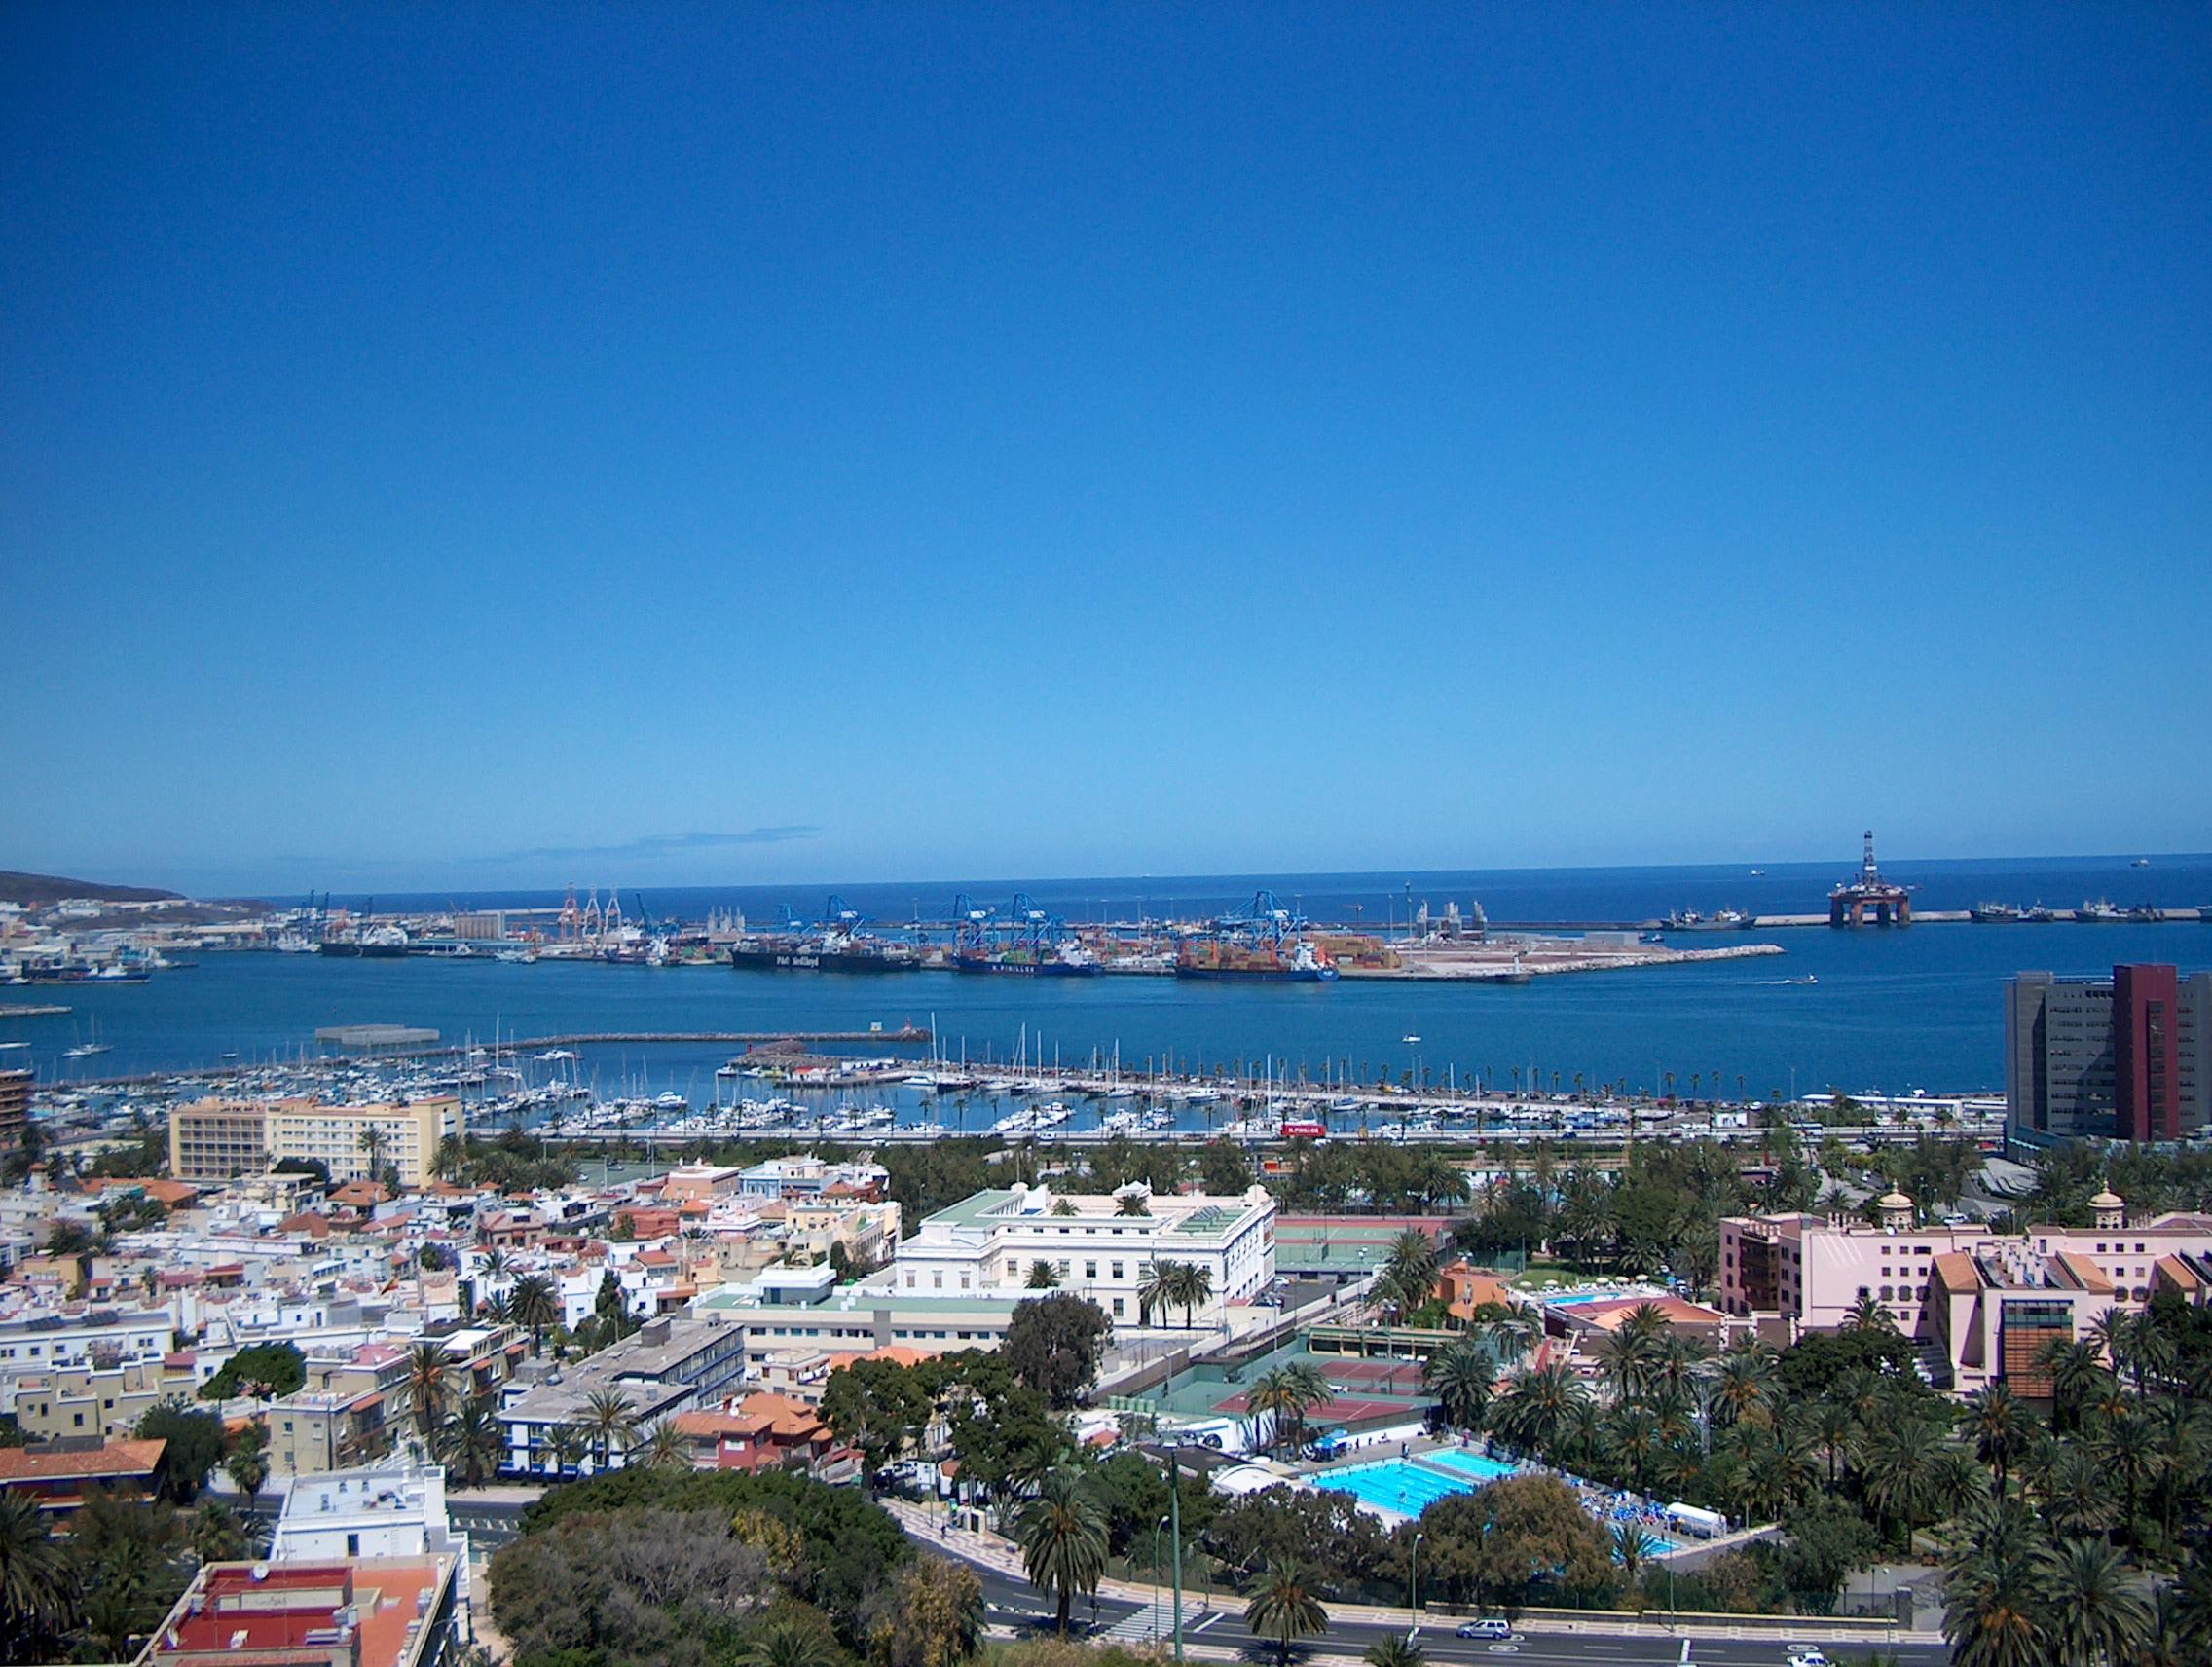 Sehr viele Hin- & Rückflüge nach Las Palmas (Gran Canaria) für 95€ inkl. Gepäck, etc. // inkl. Mietwagen & Hostel ab ca. 210€/Person